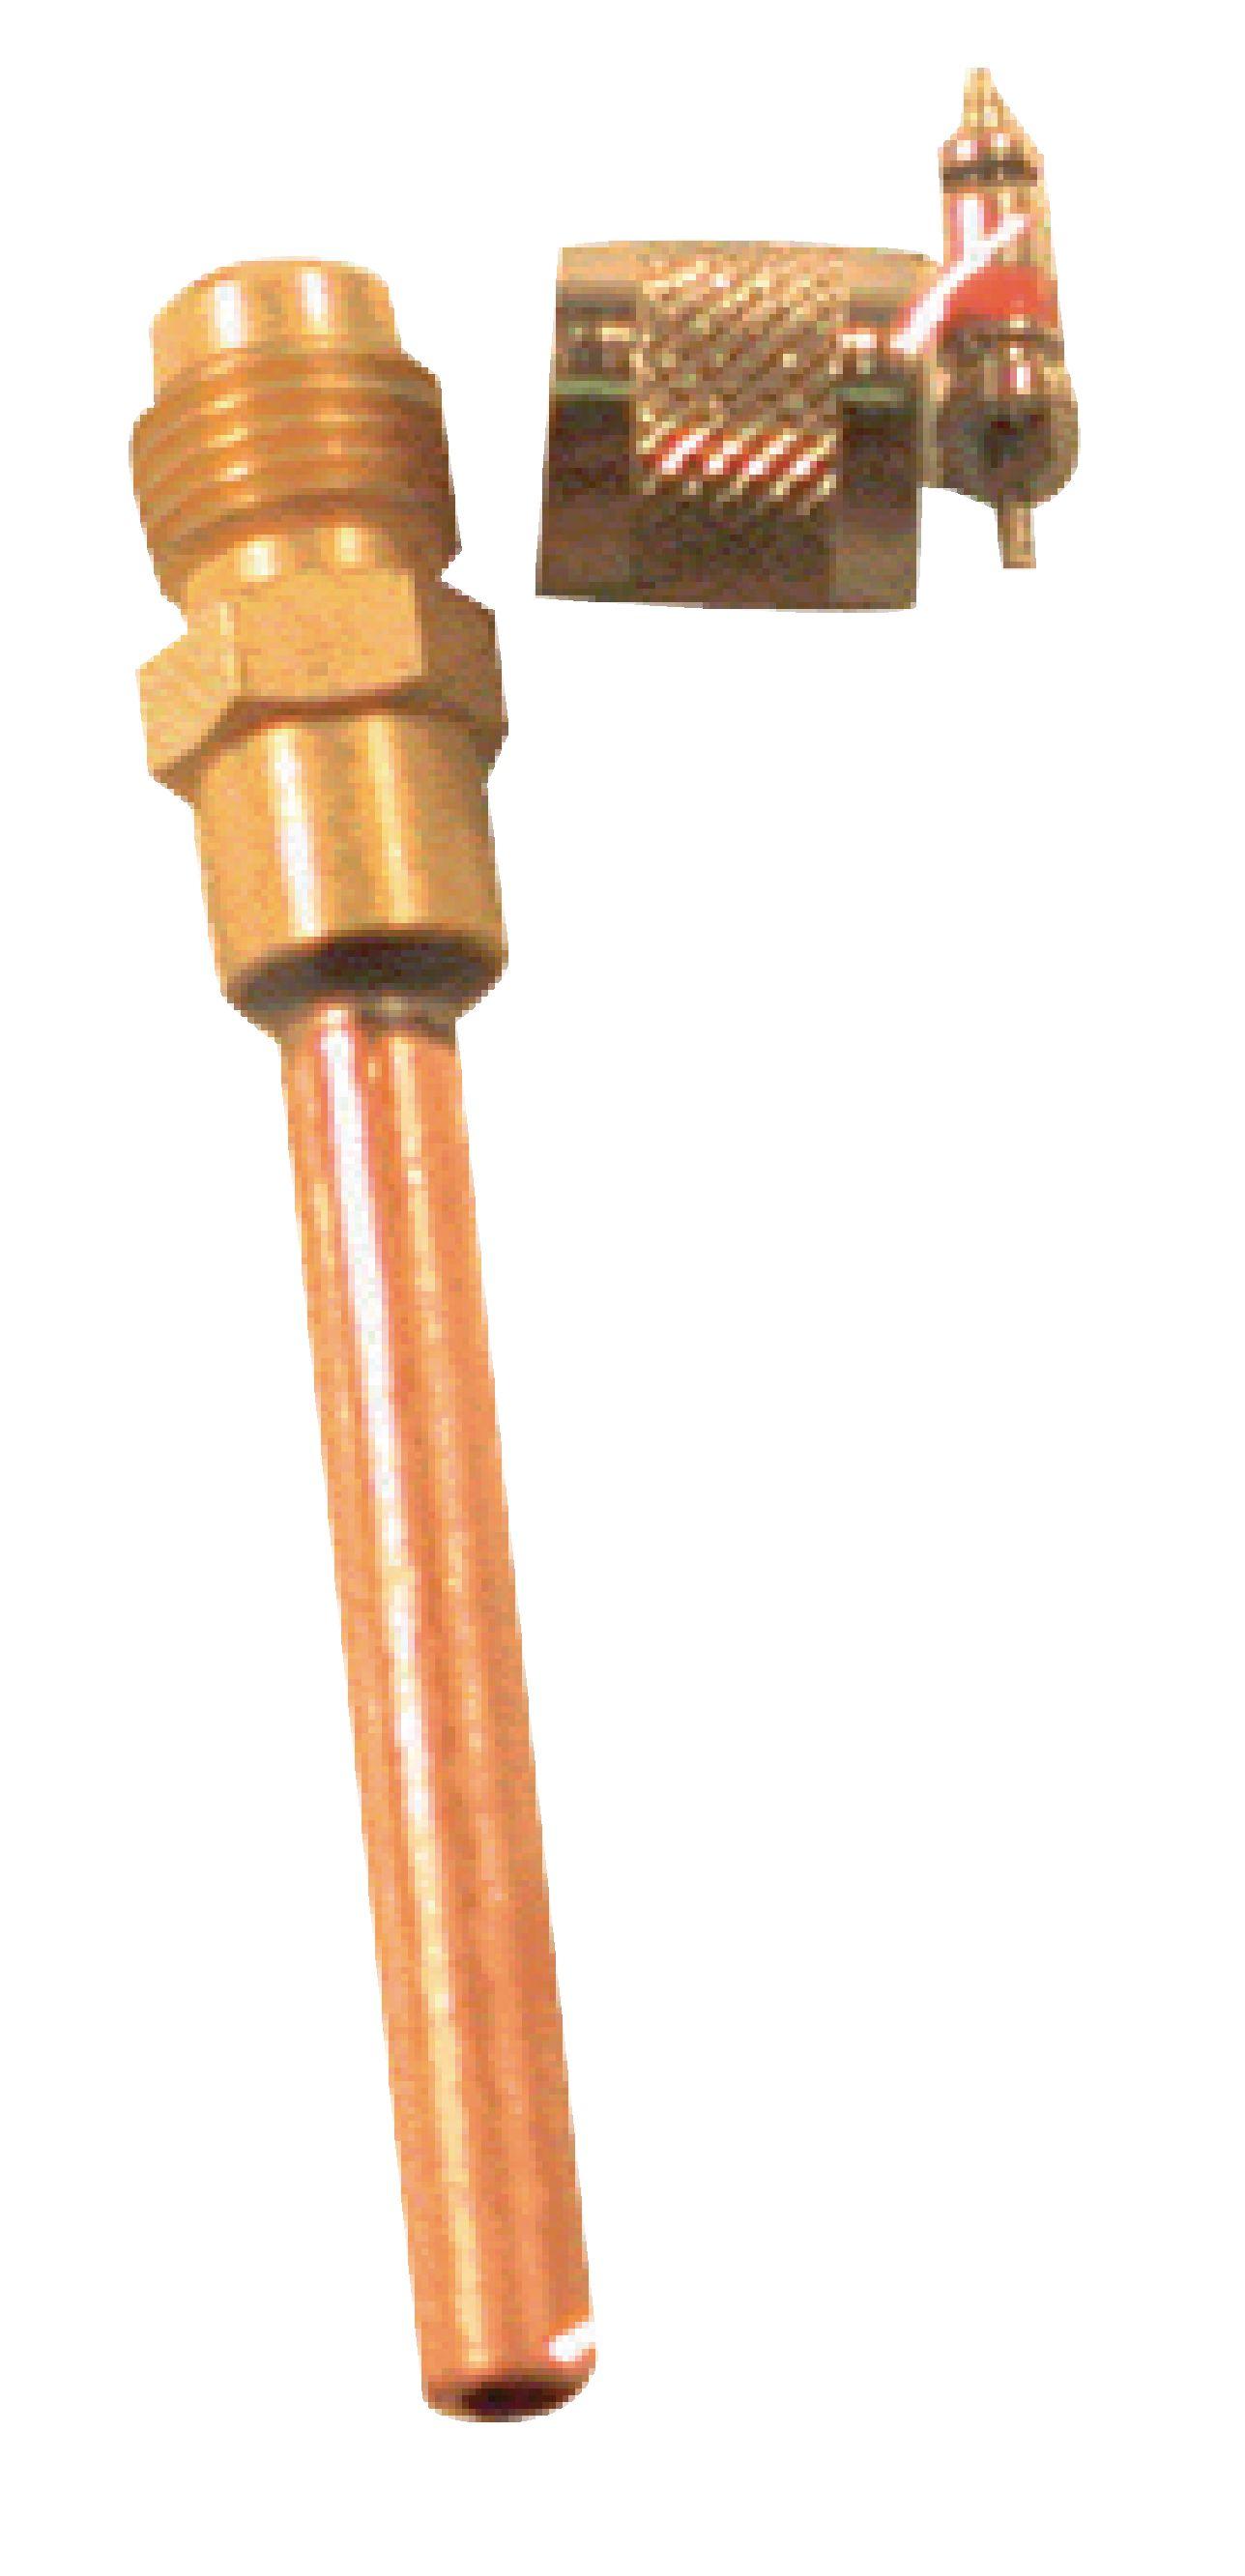 ventil-kuhlschrank-original-teilenummer-a-31004-m-1-4